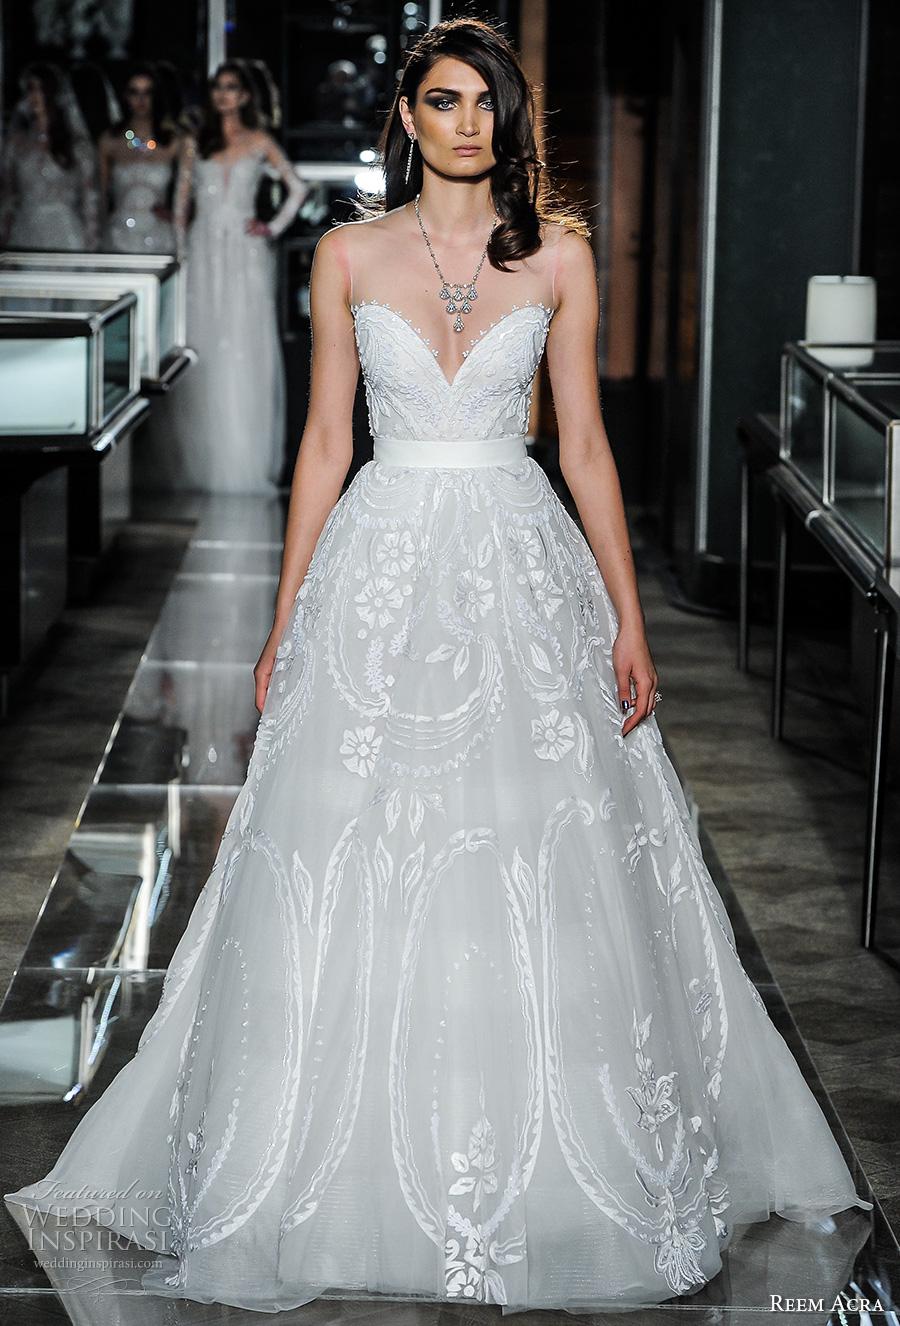 Reem Acra Wedding Gown 32 Spectacular reem acra spring bridal